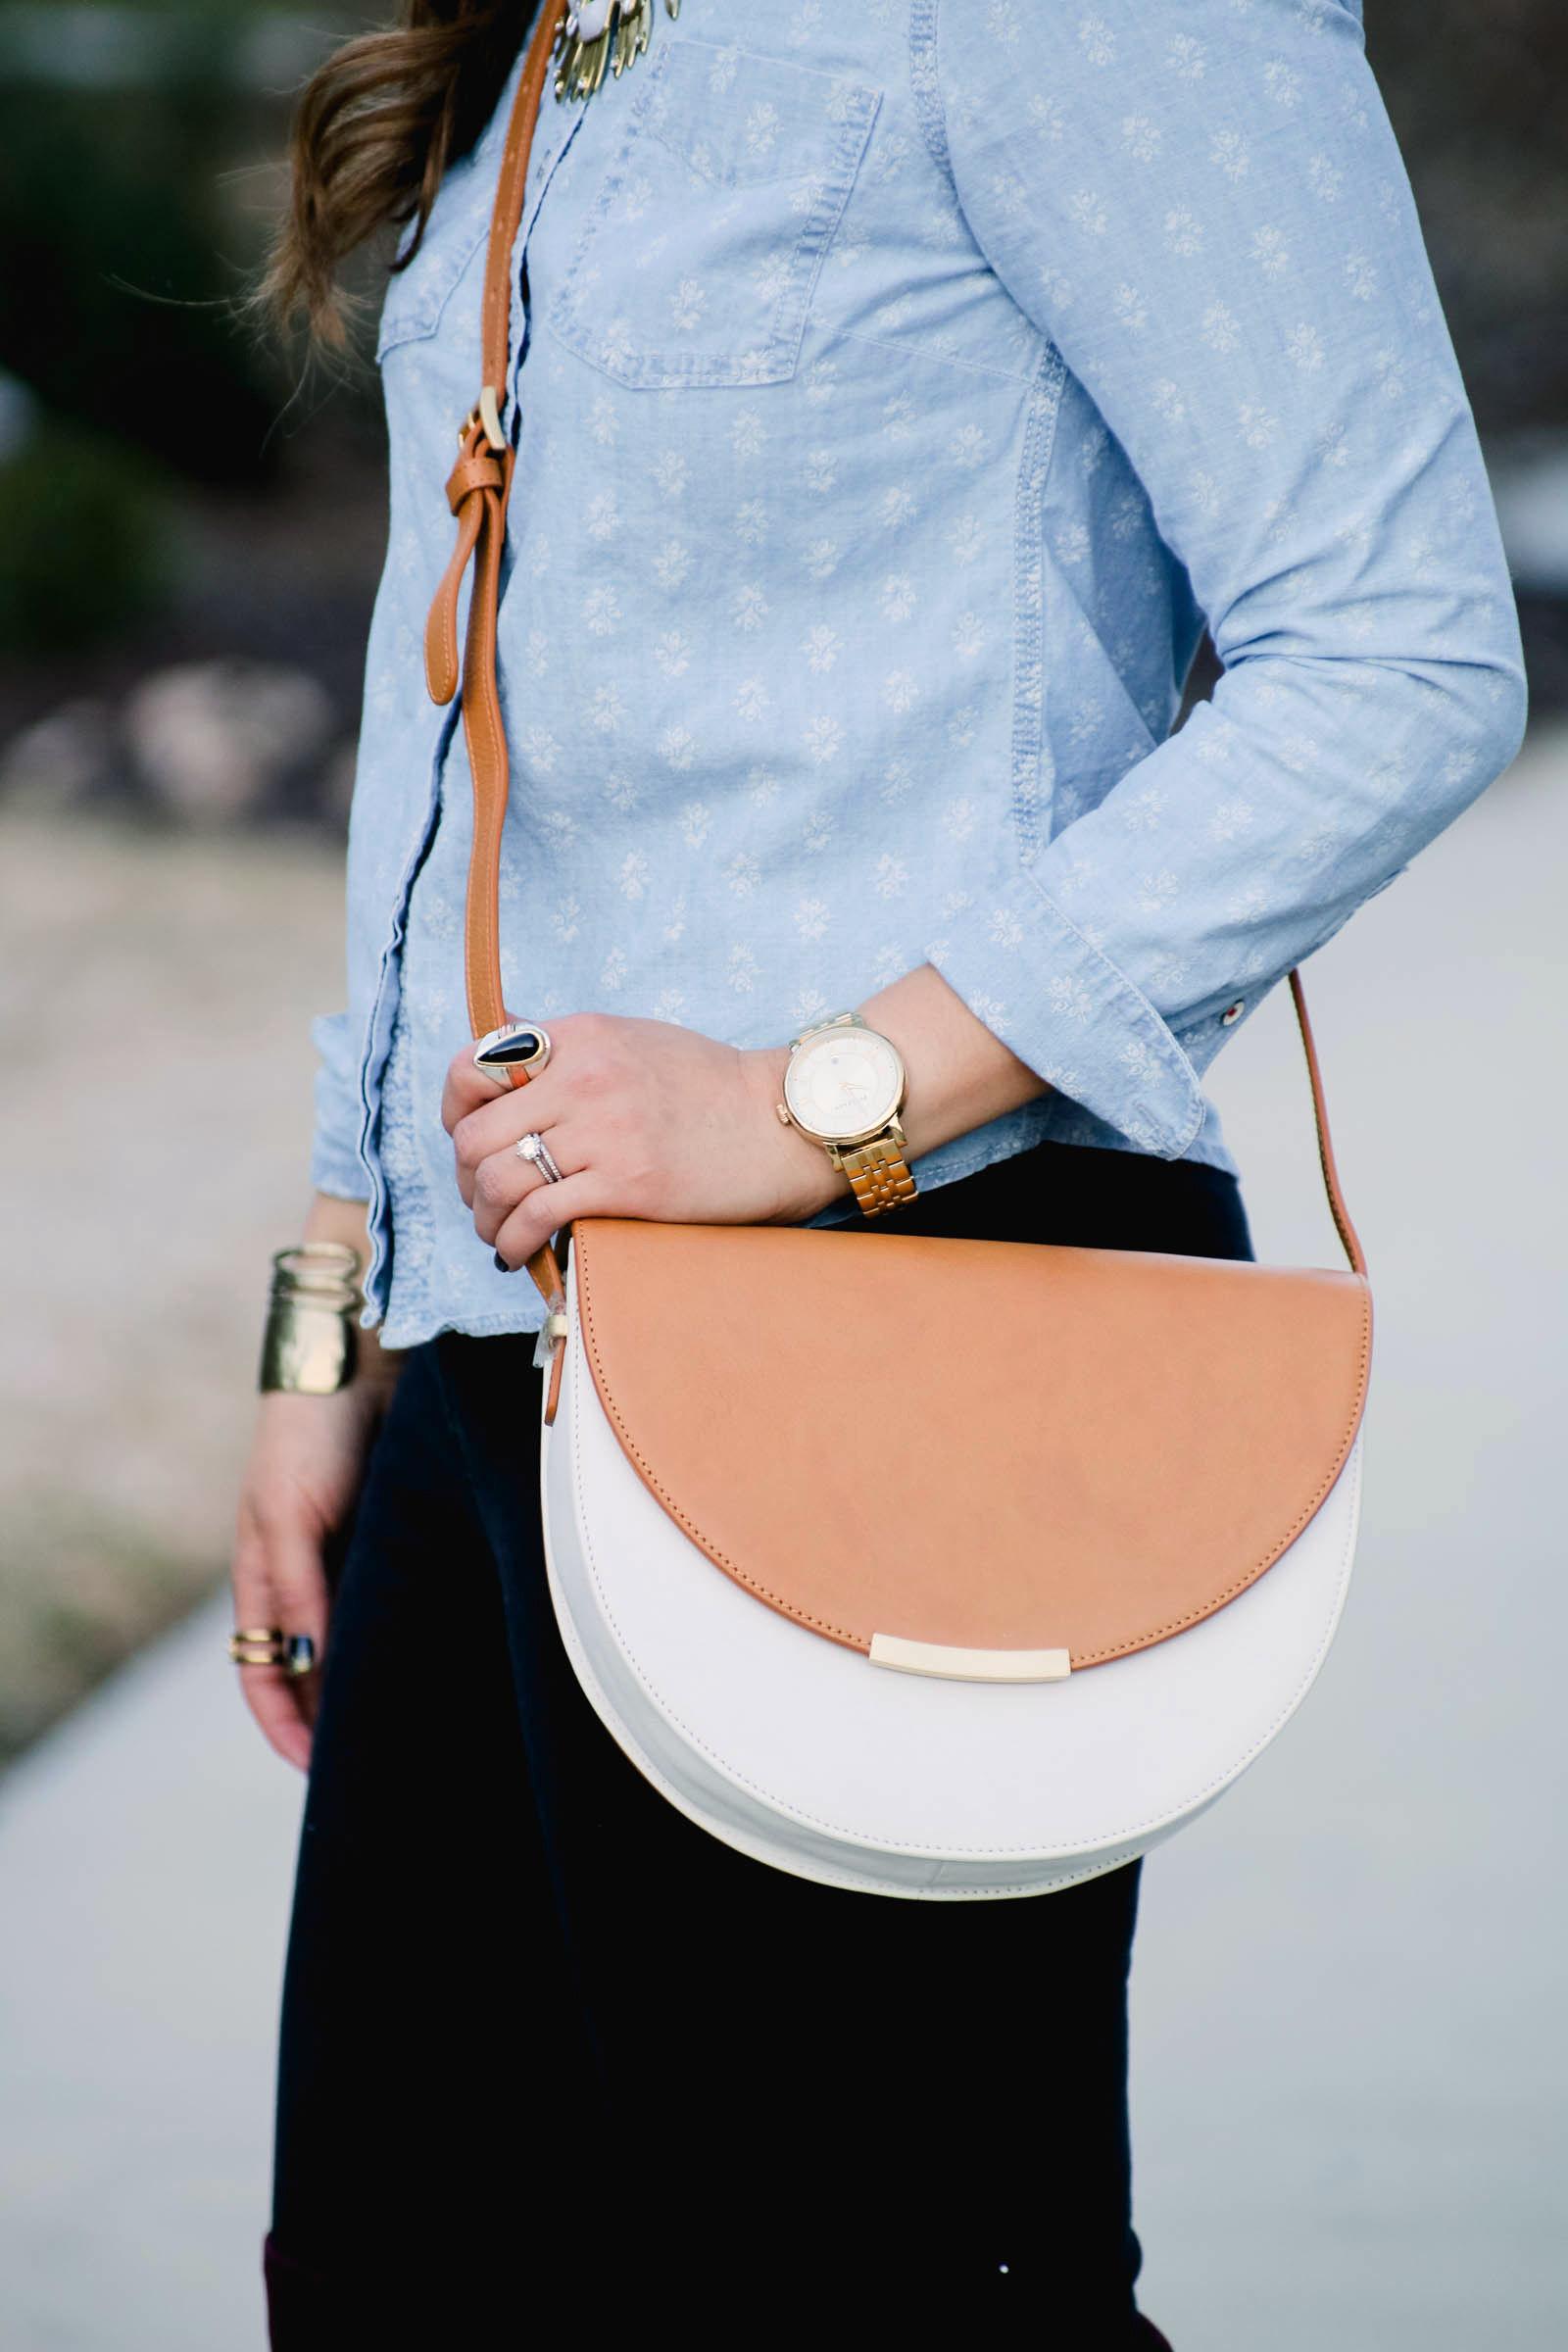 Silpada handbag